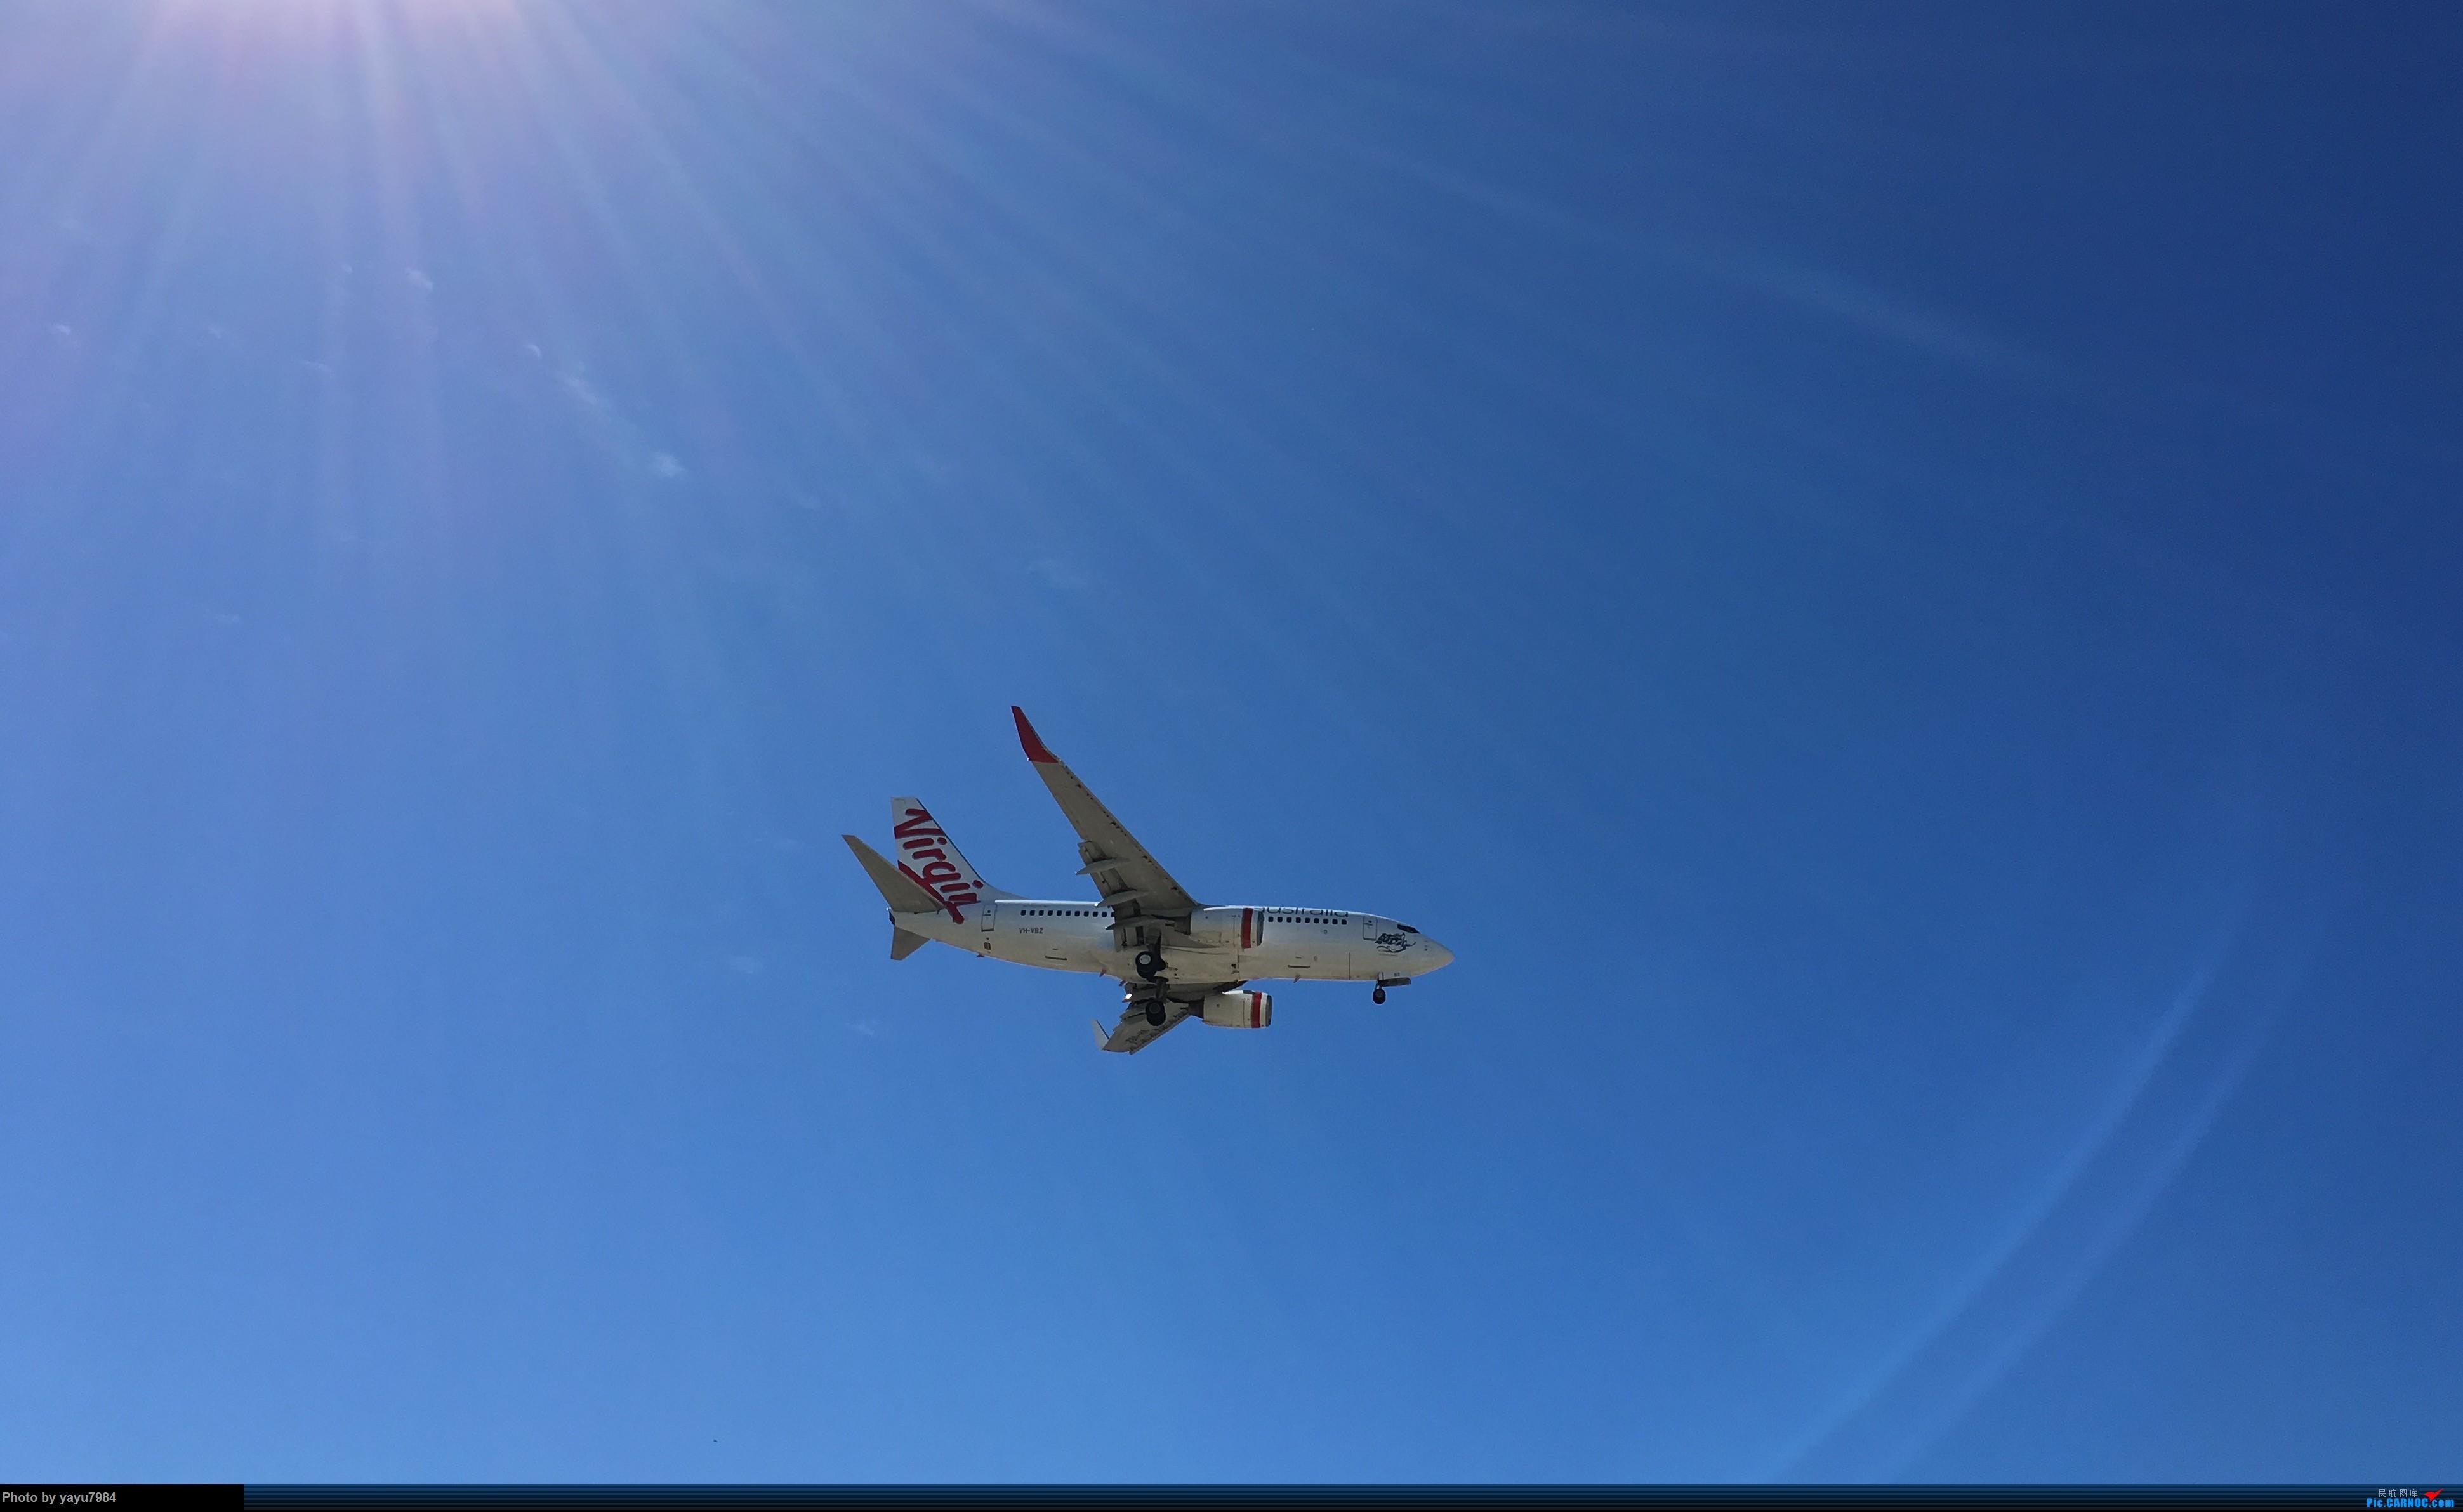 Re:[原创][SYD] 久违的南向起降,纪录16R拍机之行 BOEING 737-700 VH-VBZ 澳大利亚悉尼金斯福德·史密斯机场